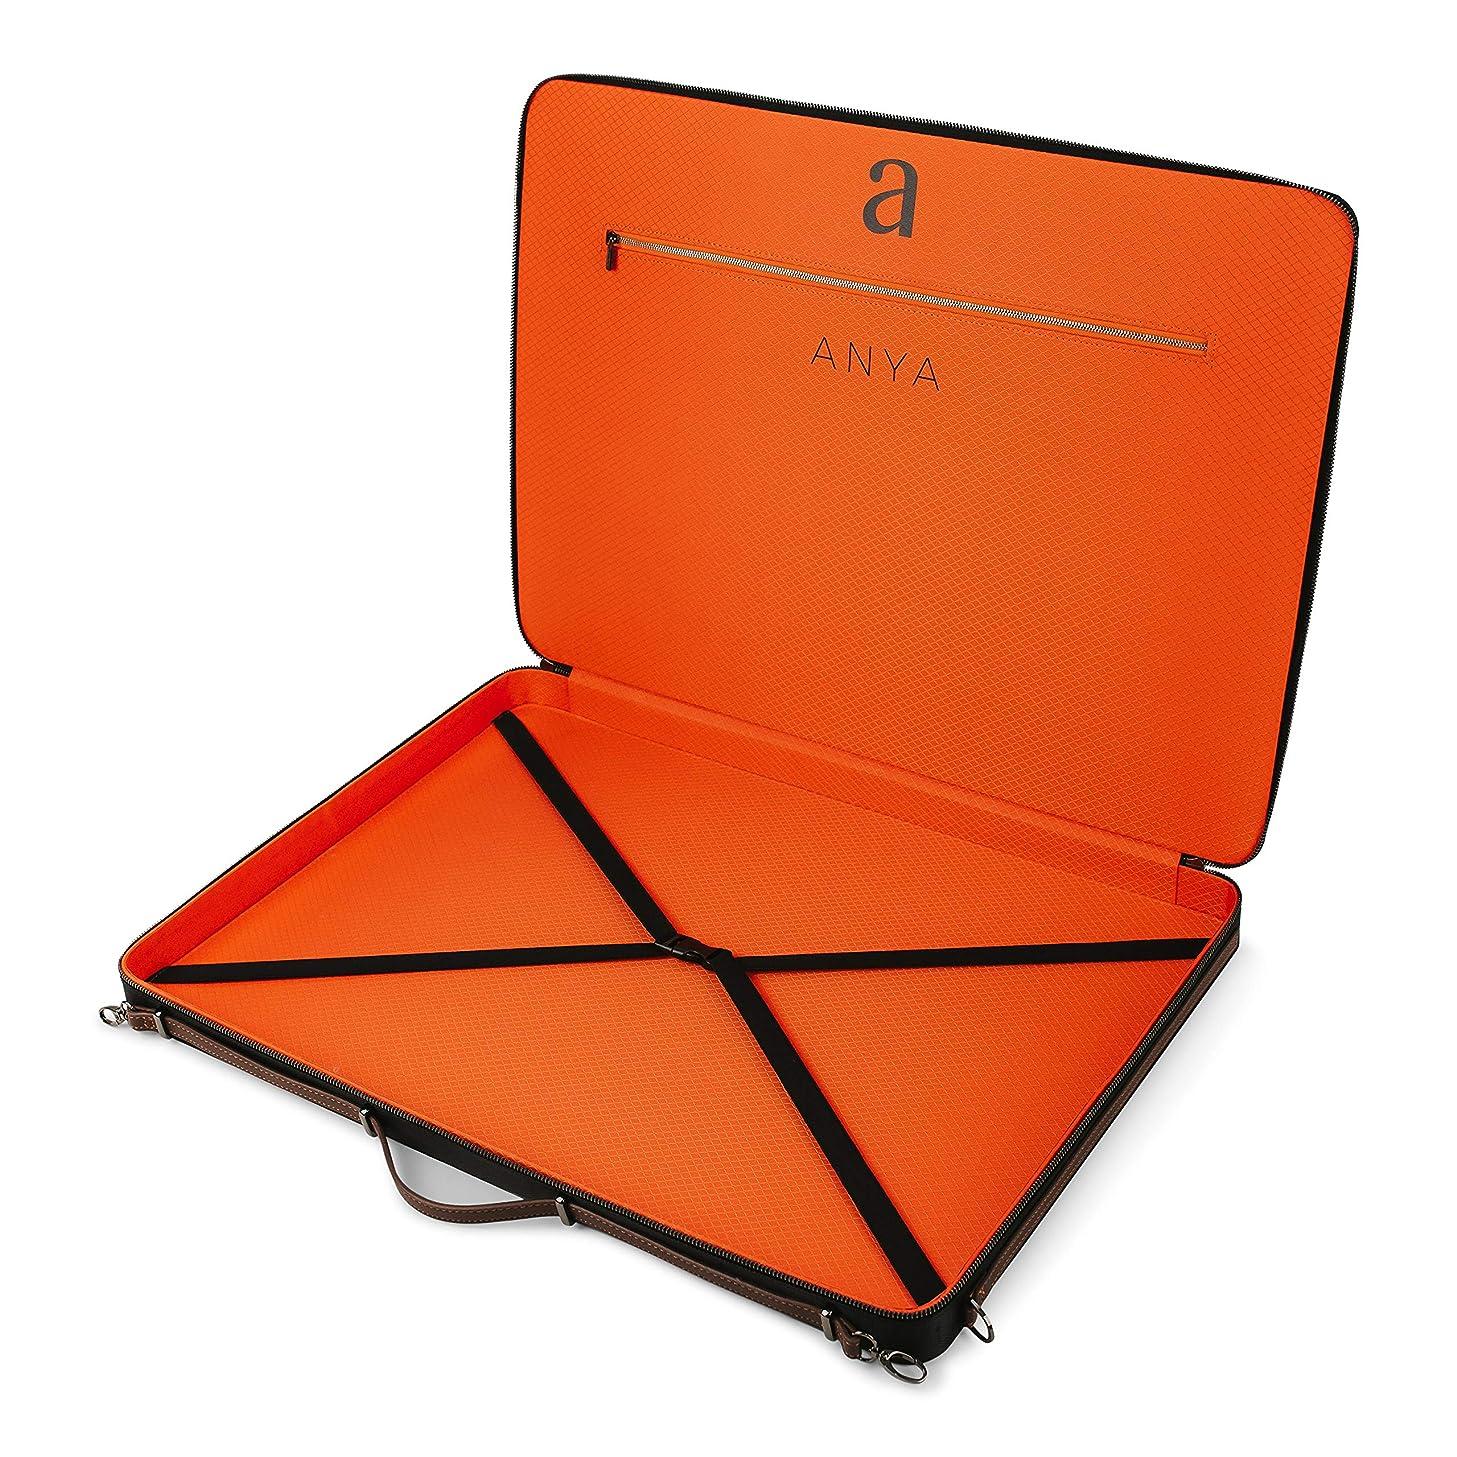 "Luxury Art Portfolio Case 17 x 24"" A2 Artist Carrying Bag   Premium Business Artwork Storage Folder   Professional Art Organizer   Drawings Sketches Foam Board Carry Waterproof Briefcase   Anya SKAPA"